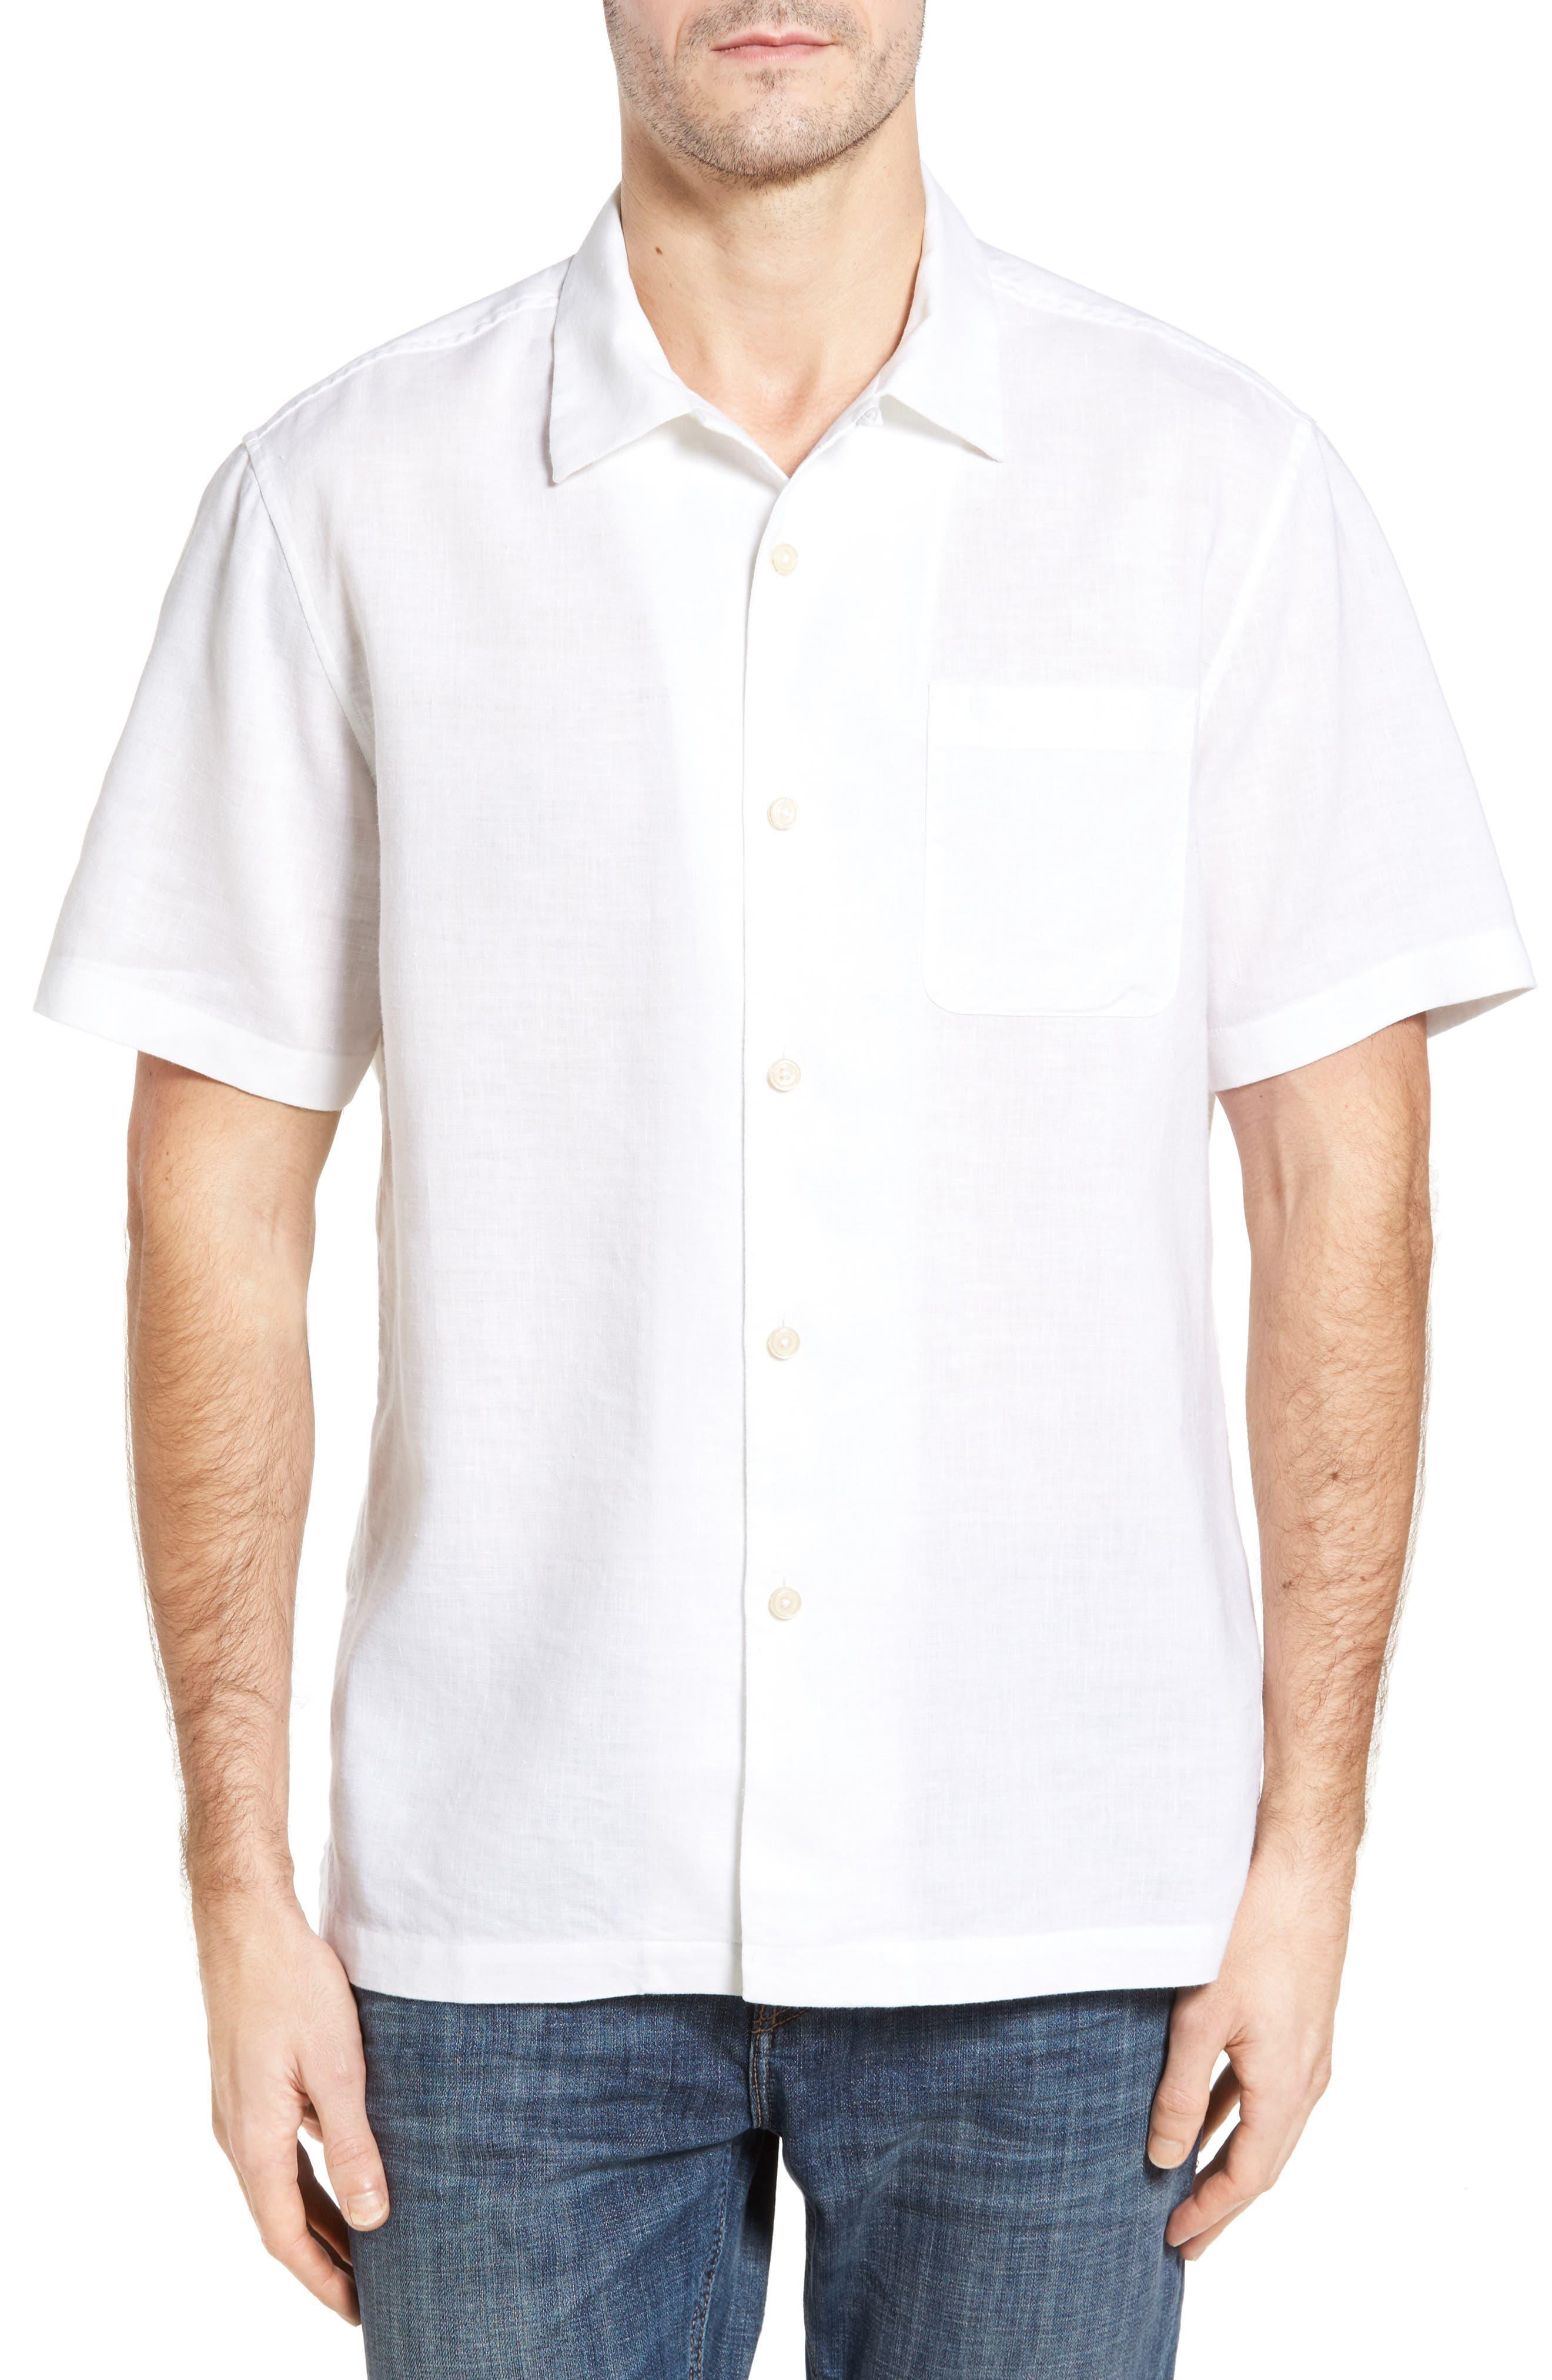 Alternate Image 1 Selected - Tommy Bahama Monaco Tides Linen Blend Camp Shirt